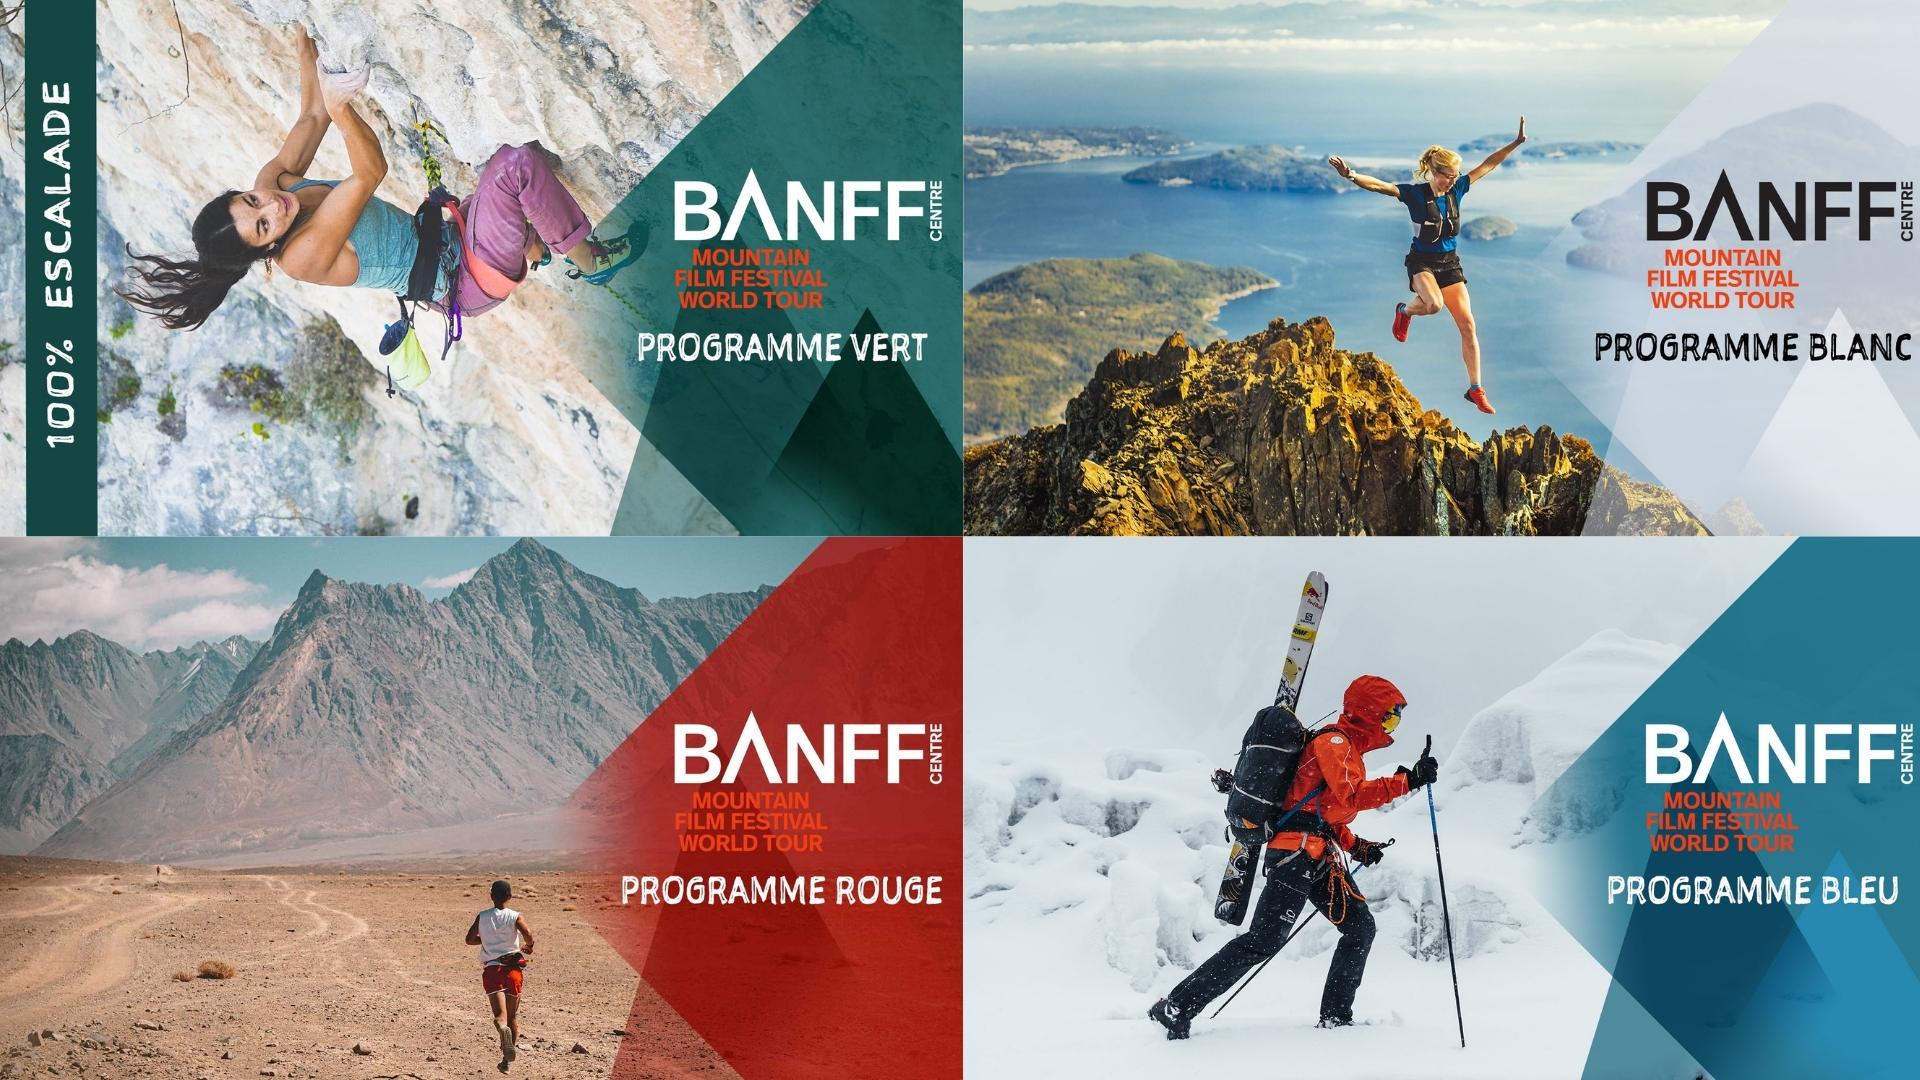 Banff 4 programmes